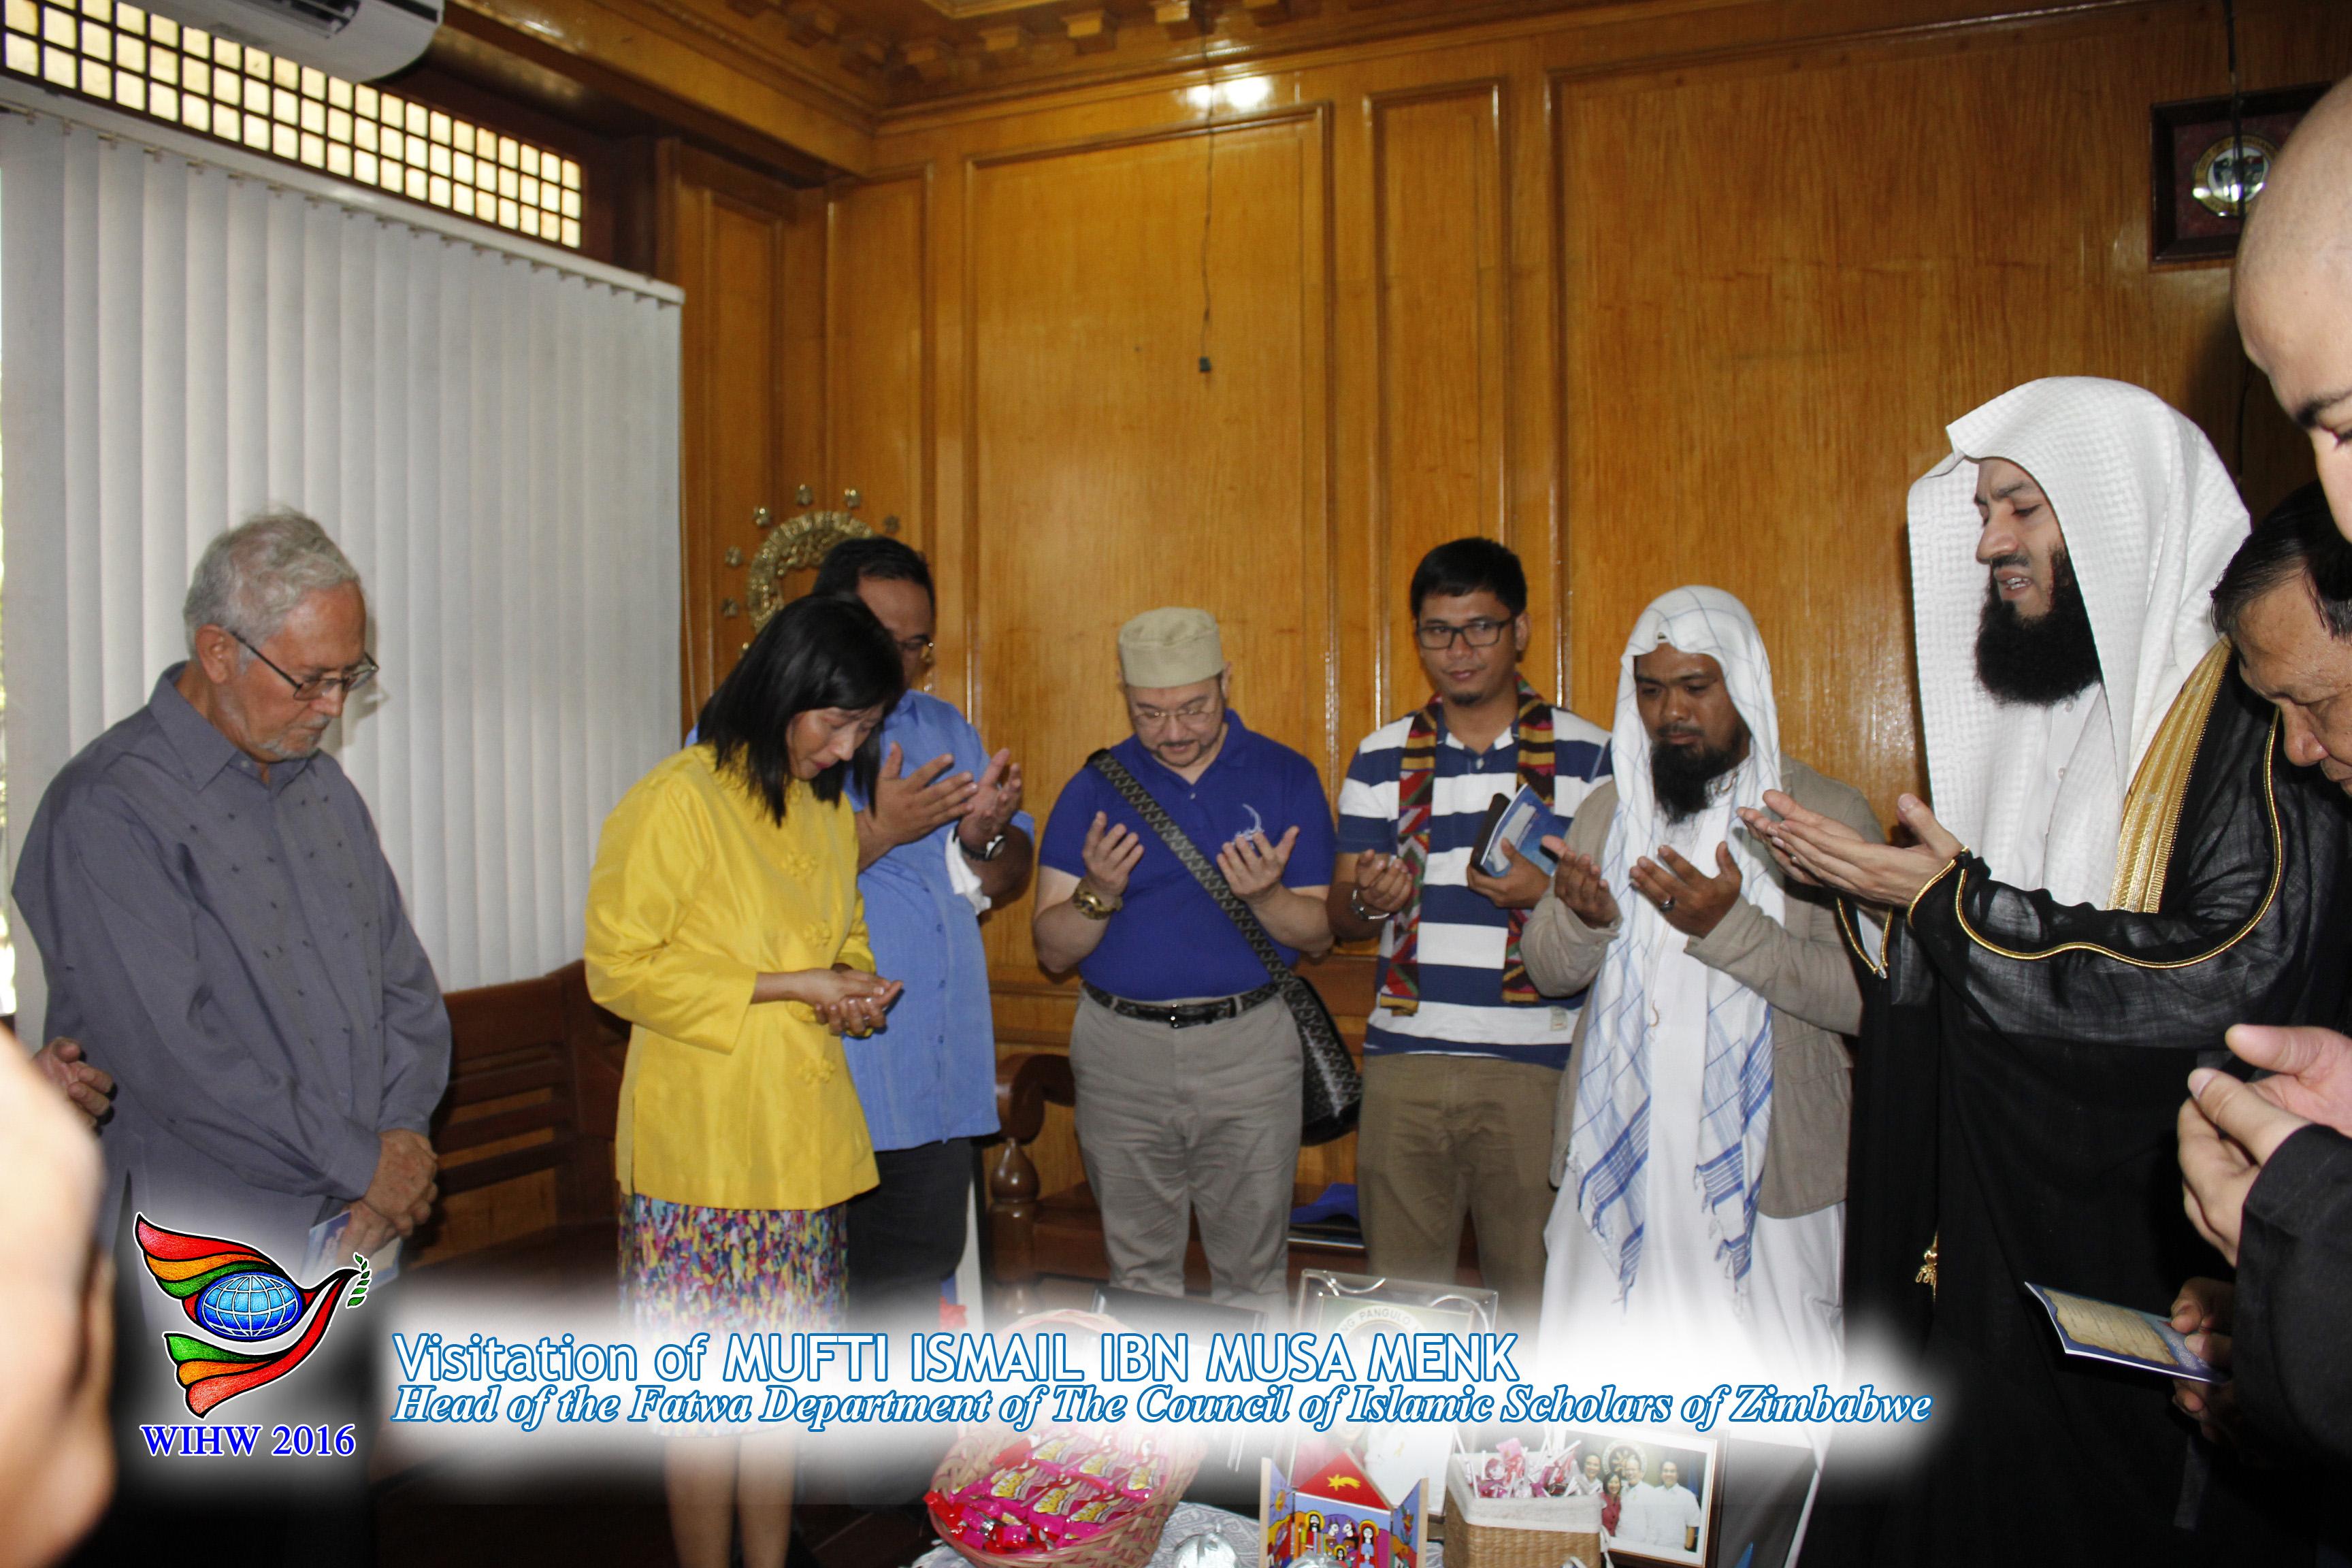 Visitation of mufti menk.jpg